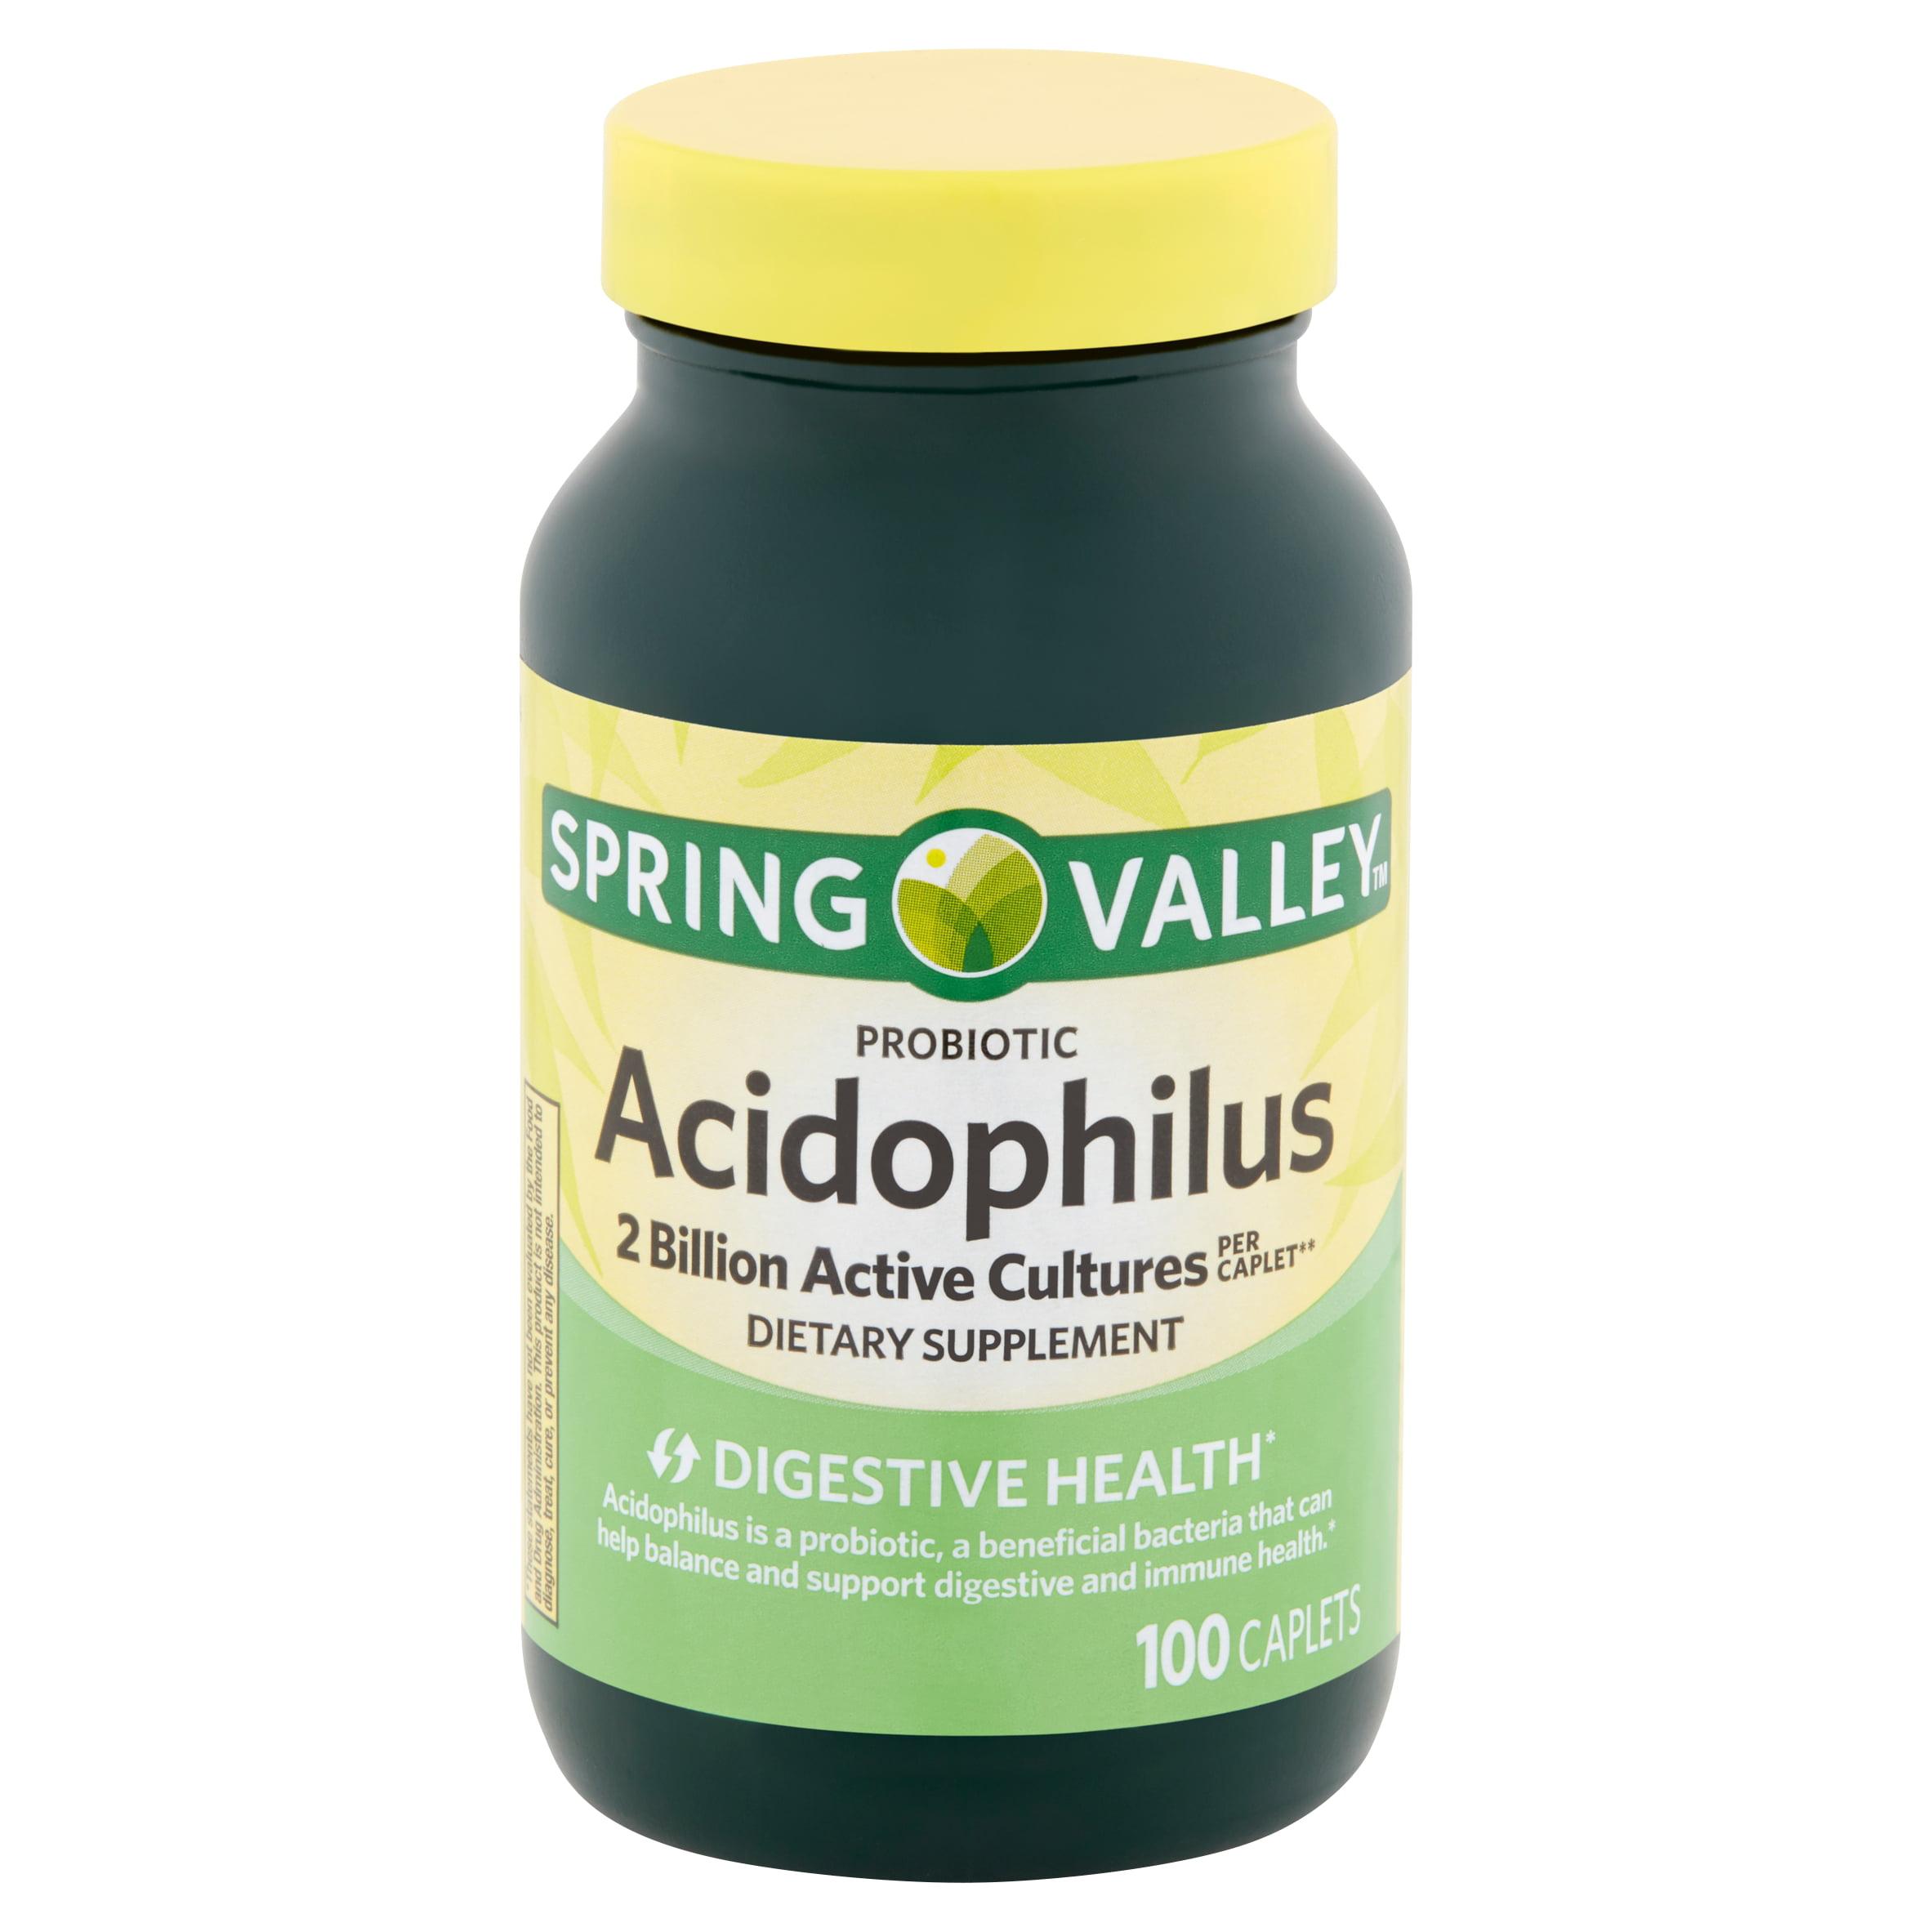 Spring Valley Probiotic Acidophilus Caplets, 100 count